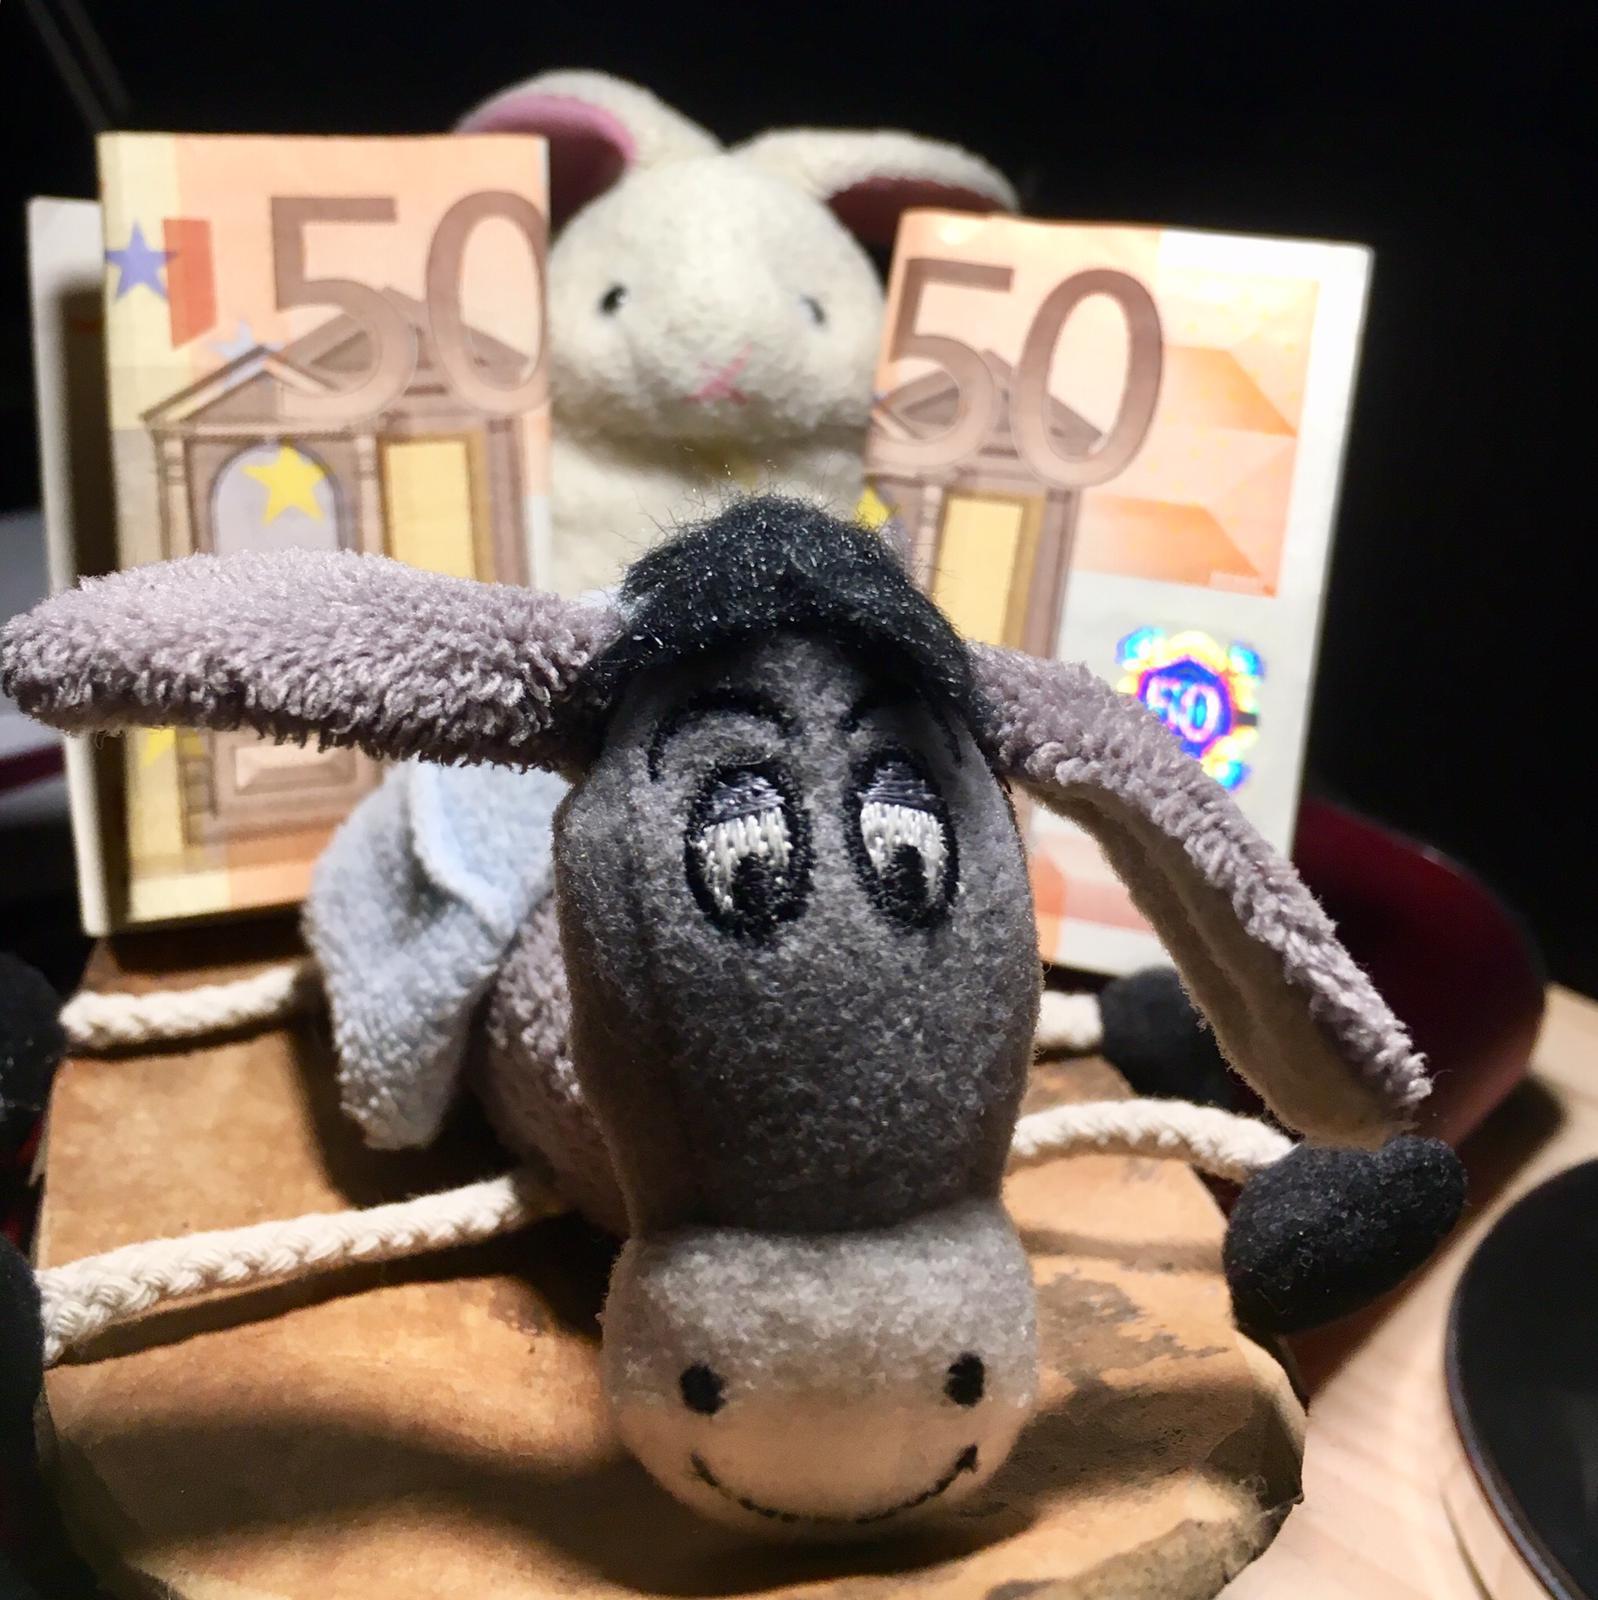 The Donkey and the Rabbit in Virunga!